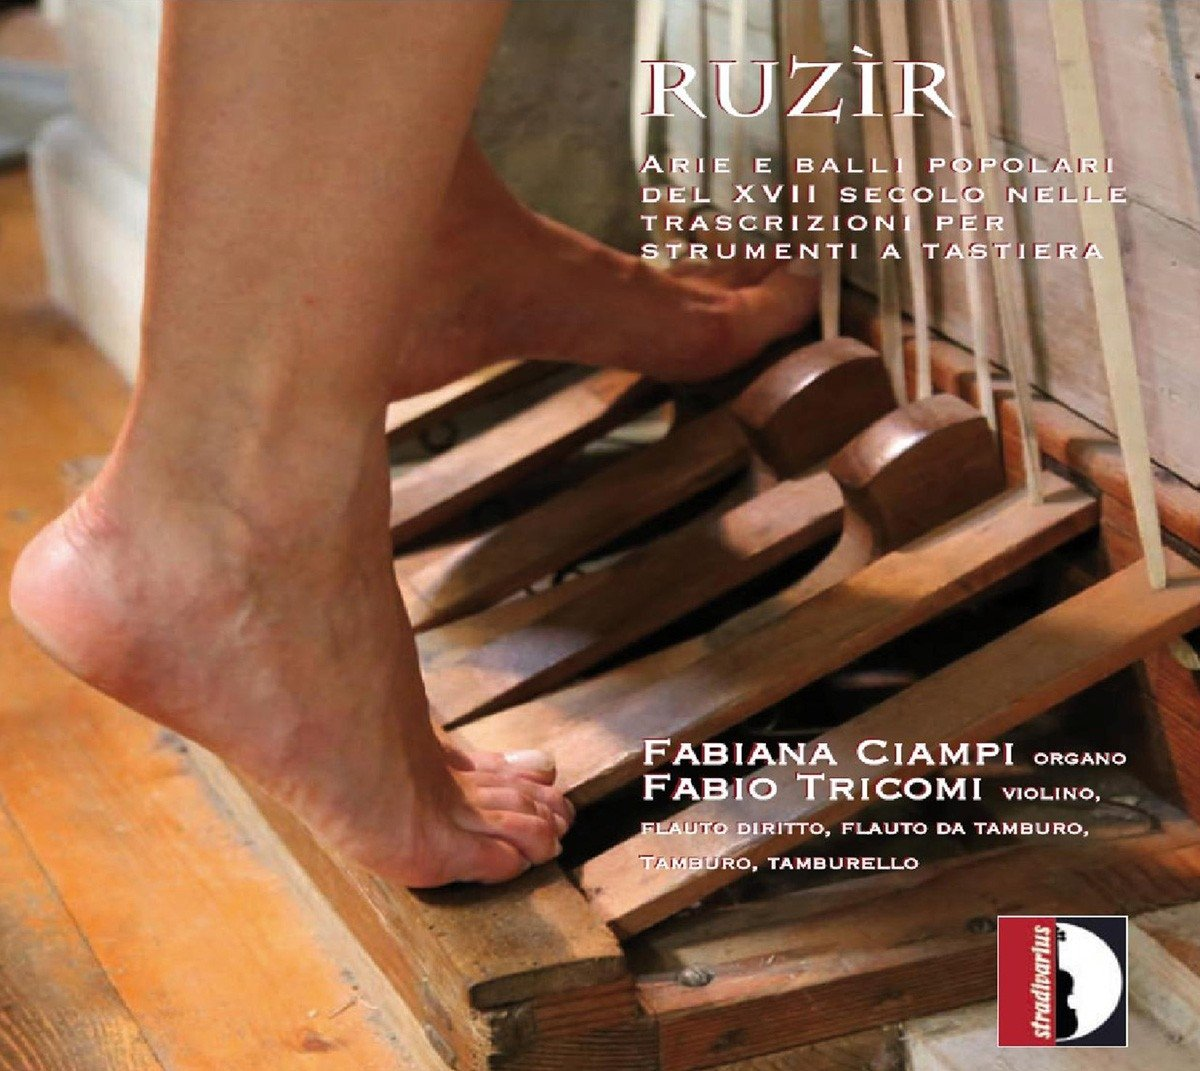 CD : FABIO TRICONI - FABIANA CIAMPI - Ruzir (CD)